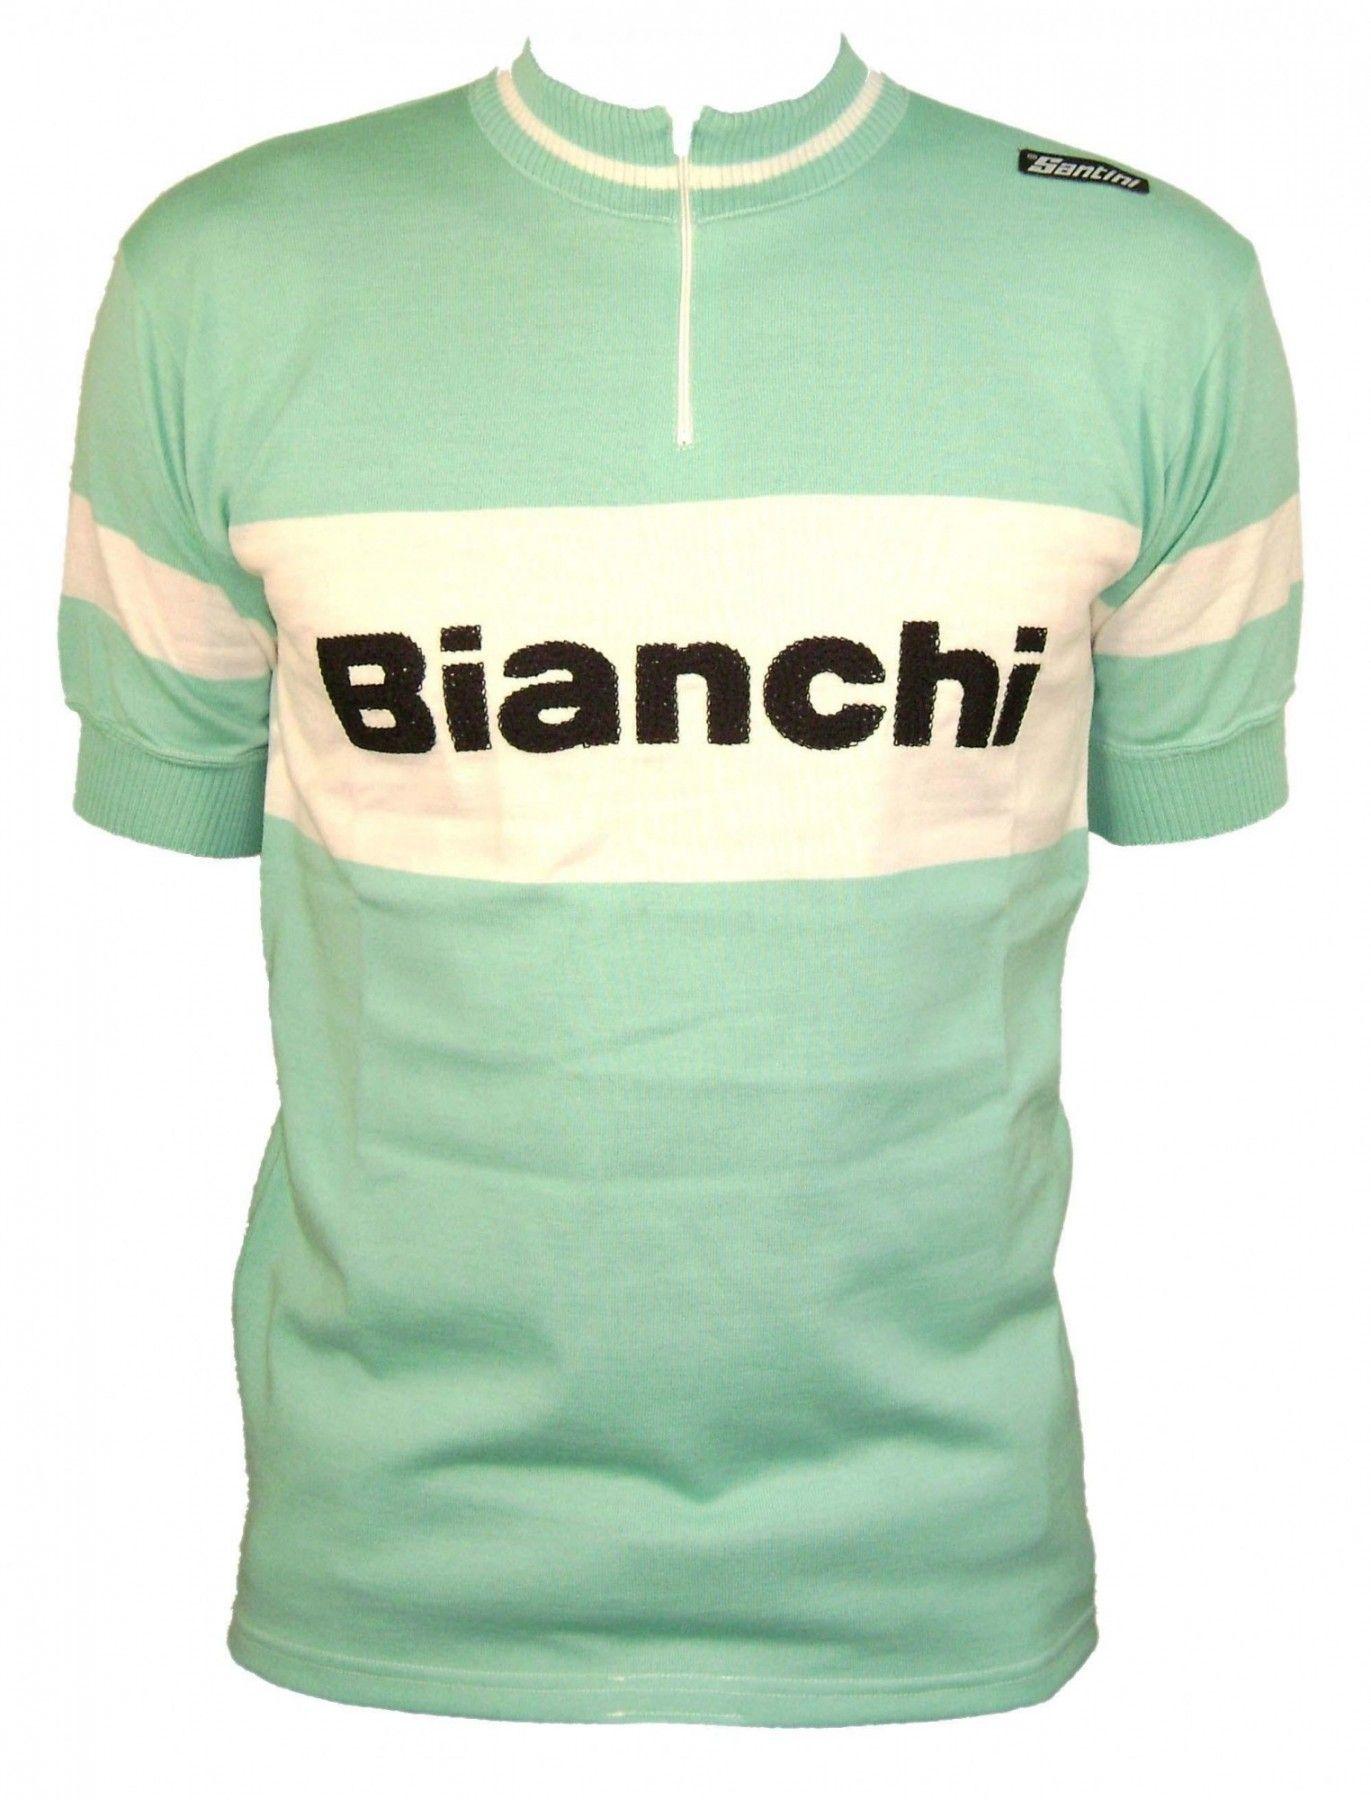 44bb2924e Bianchi s retro wool jersey in celeste